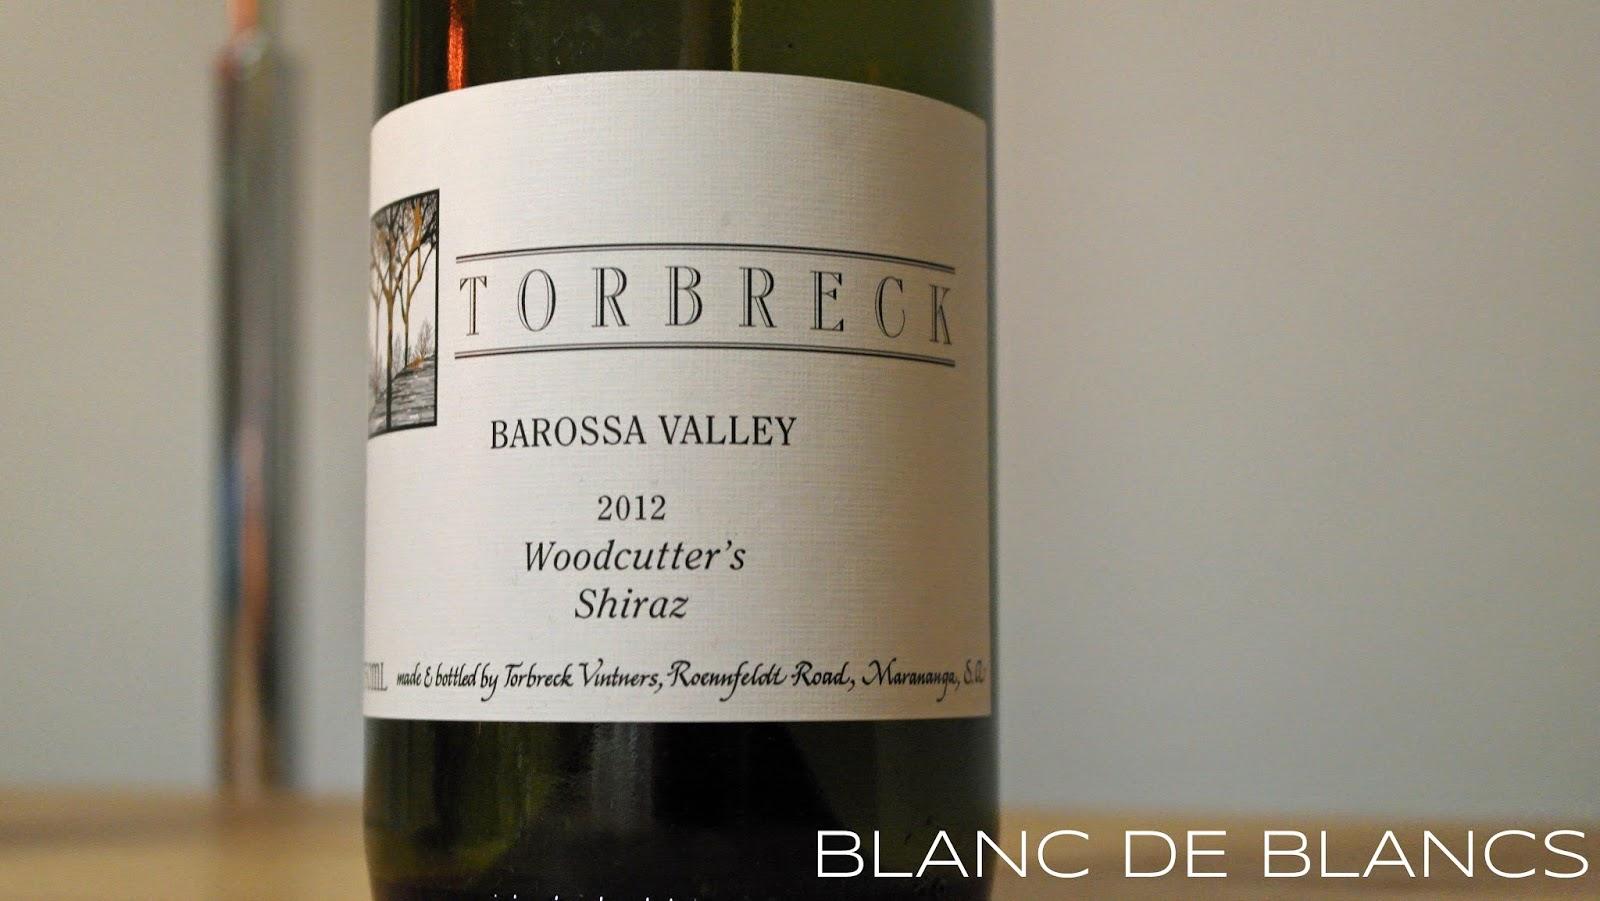 Torbreck Woodcutter's Shiraz 2012 - www.blancdeblancs.fi